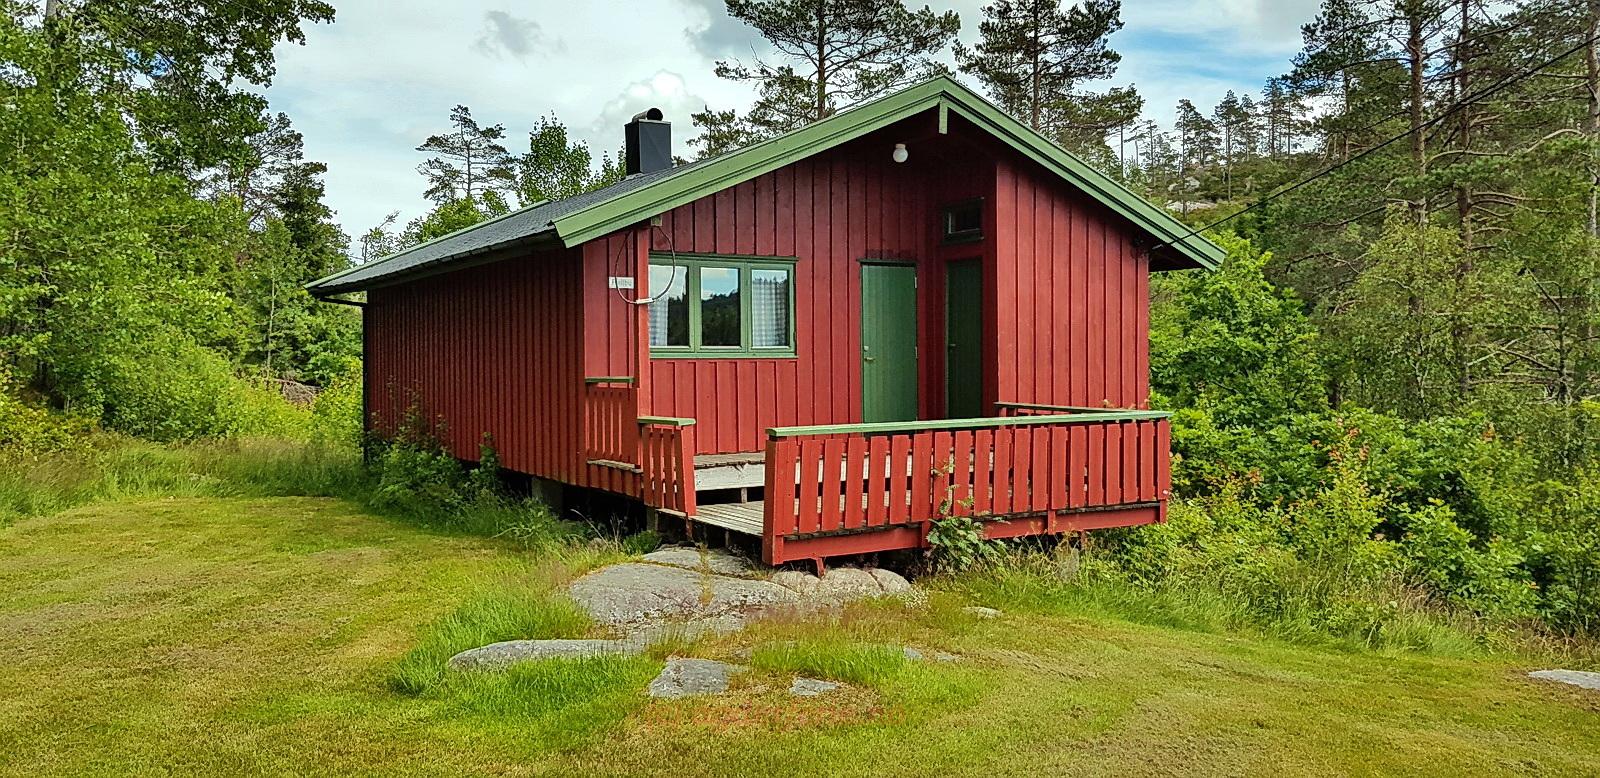 208 Fjellbu. Undeland Gård. Kvås